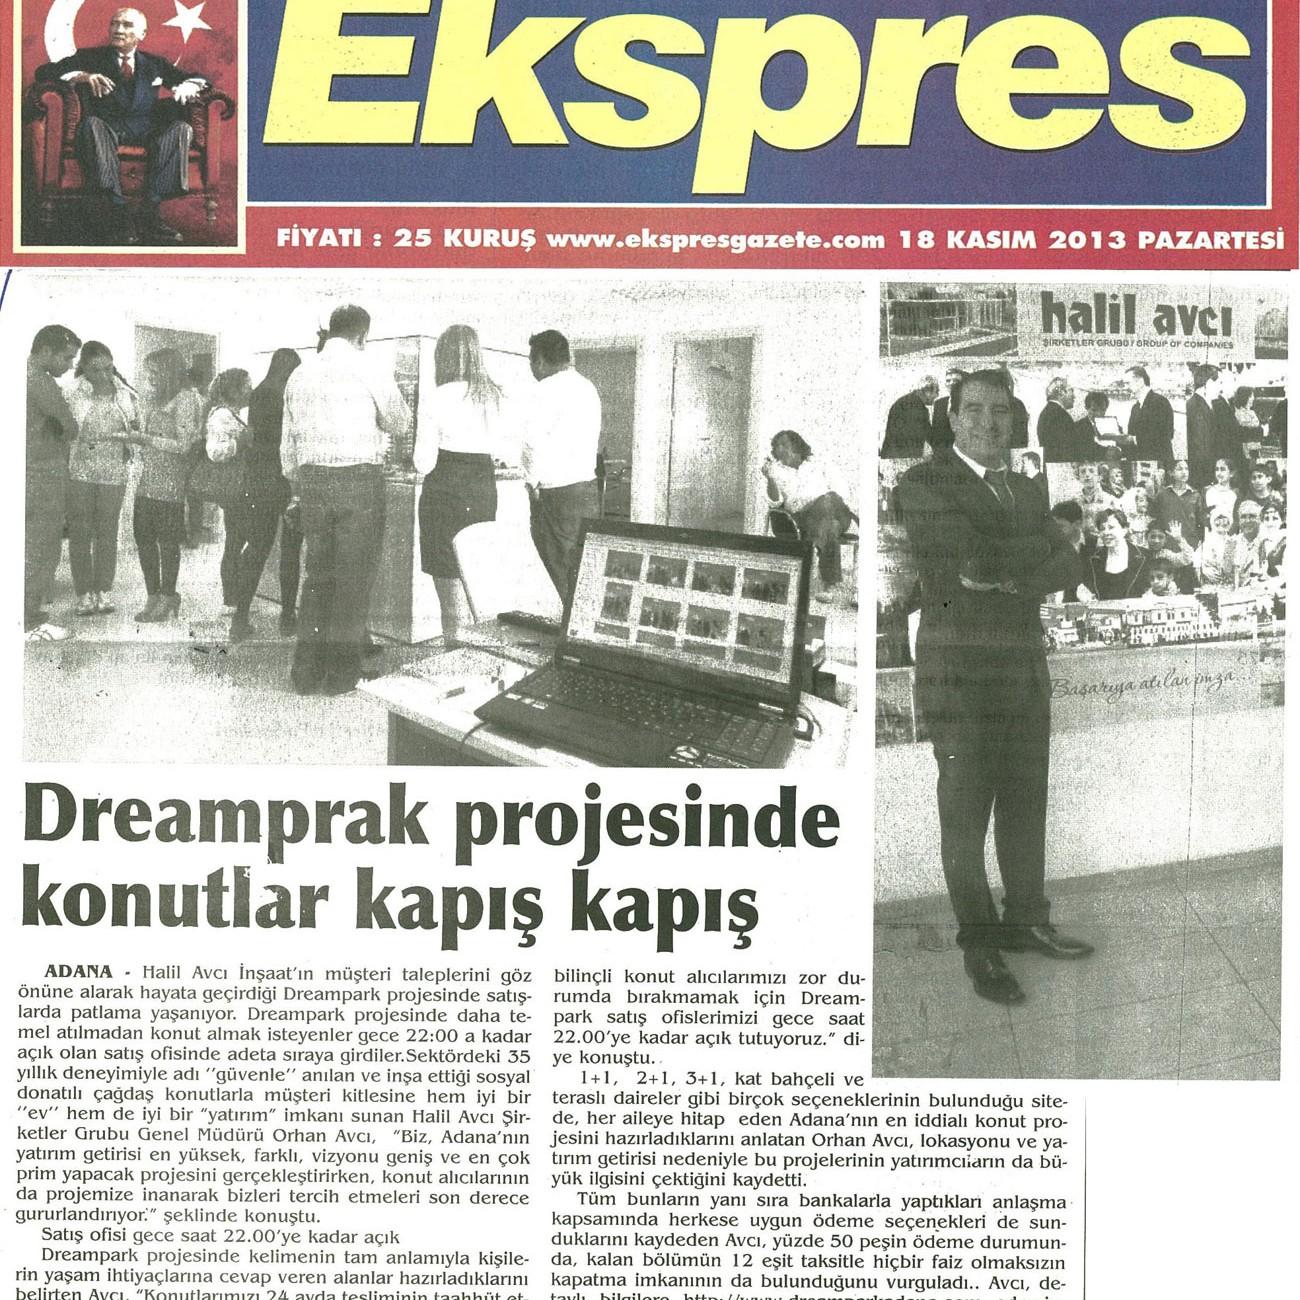 Dreampark projesinde konutlar kapış kapış – Express